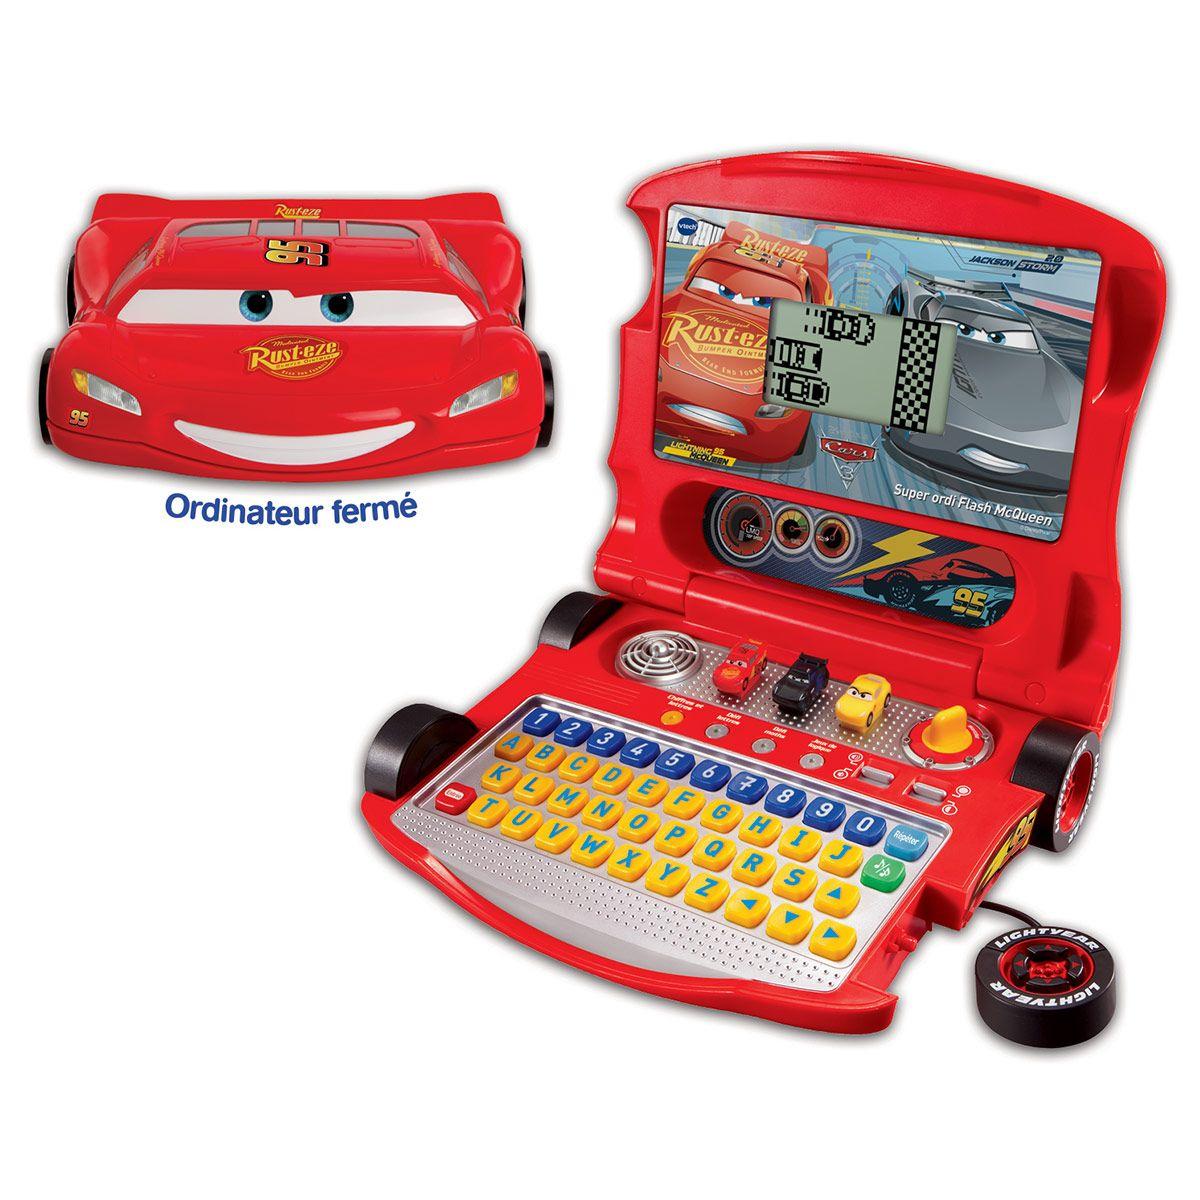 Cars 3 : Super Ordi Flash Mcqueen - Jeux Éducatifs - La concernant Ordinateur Educatif Enfant